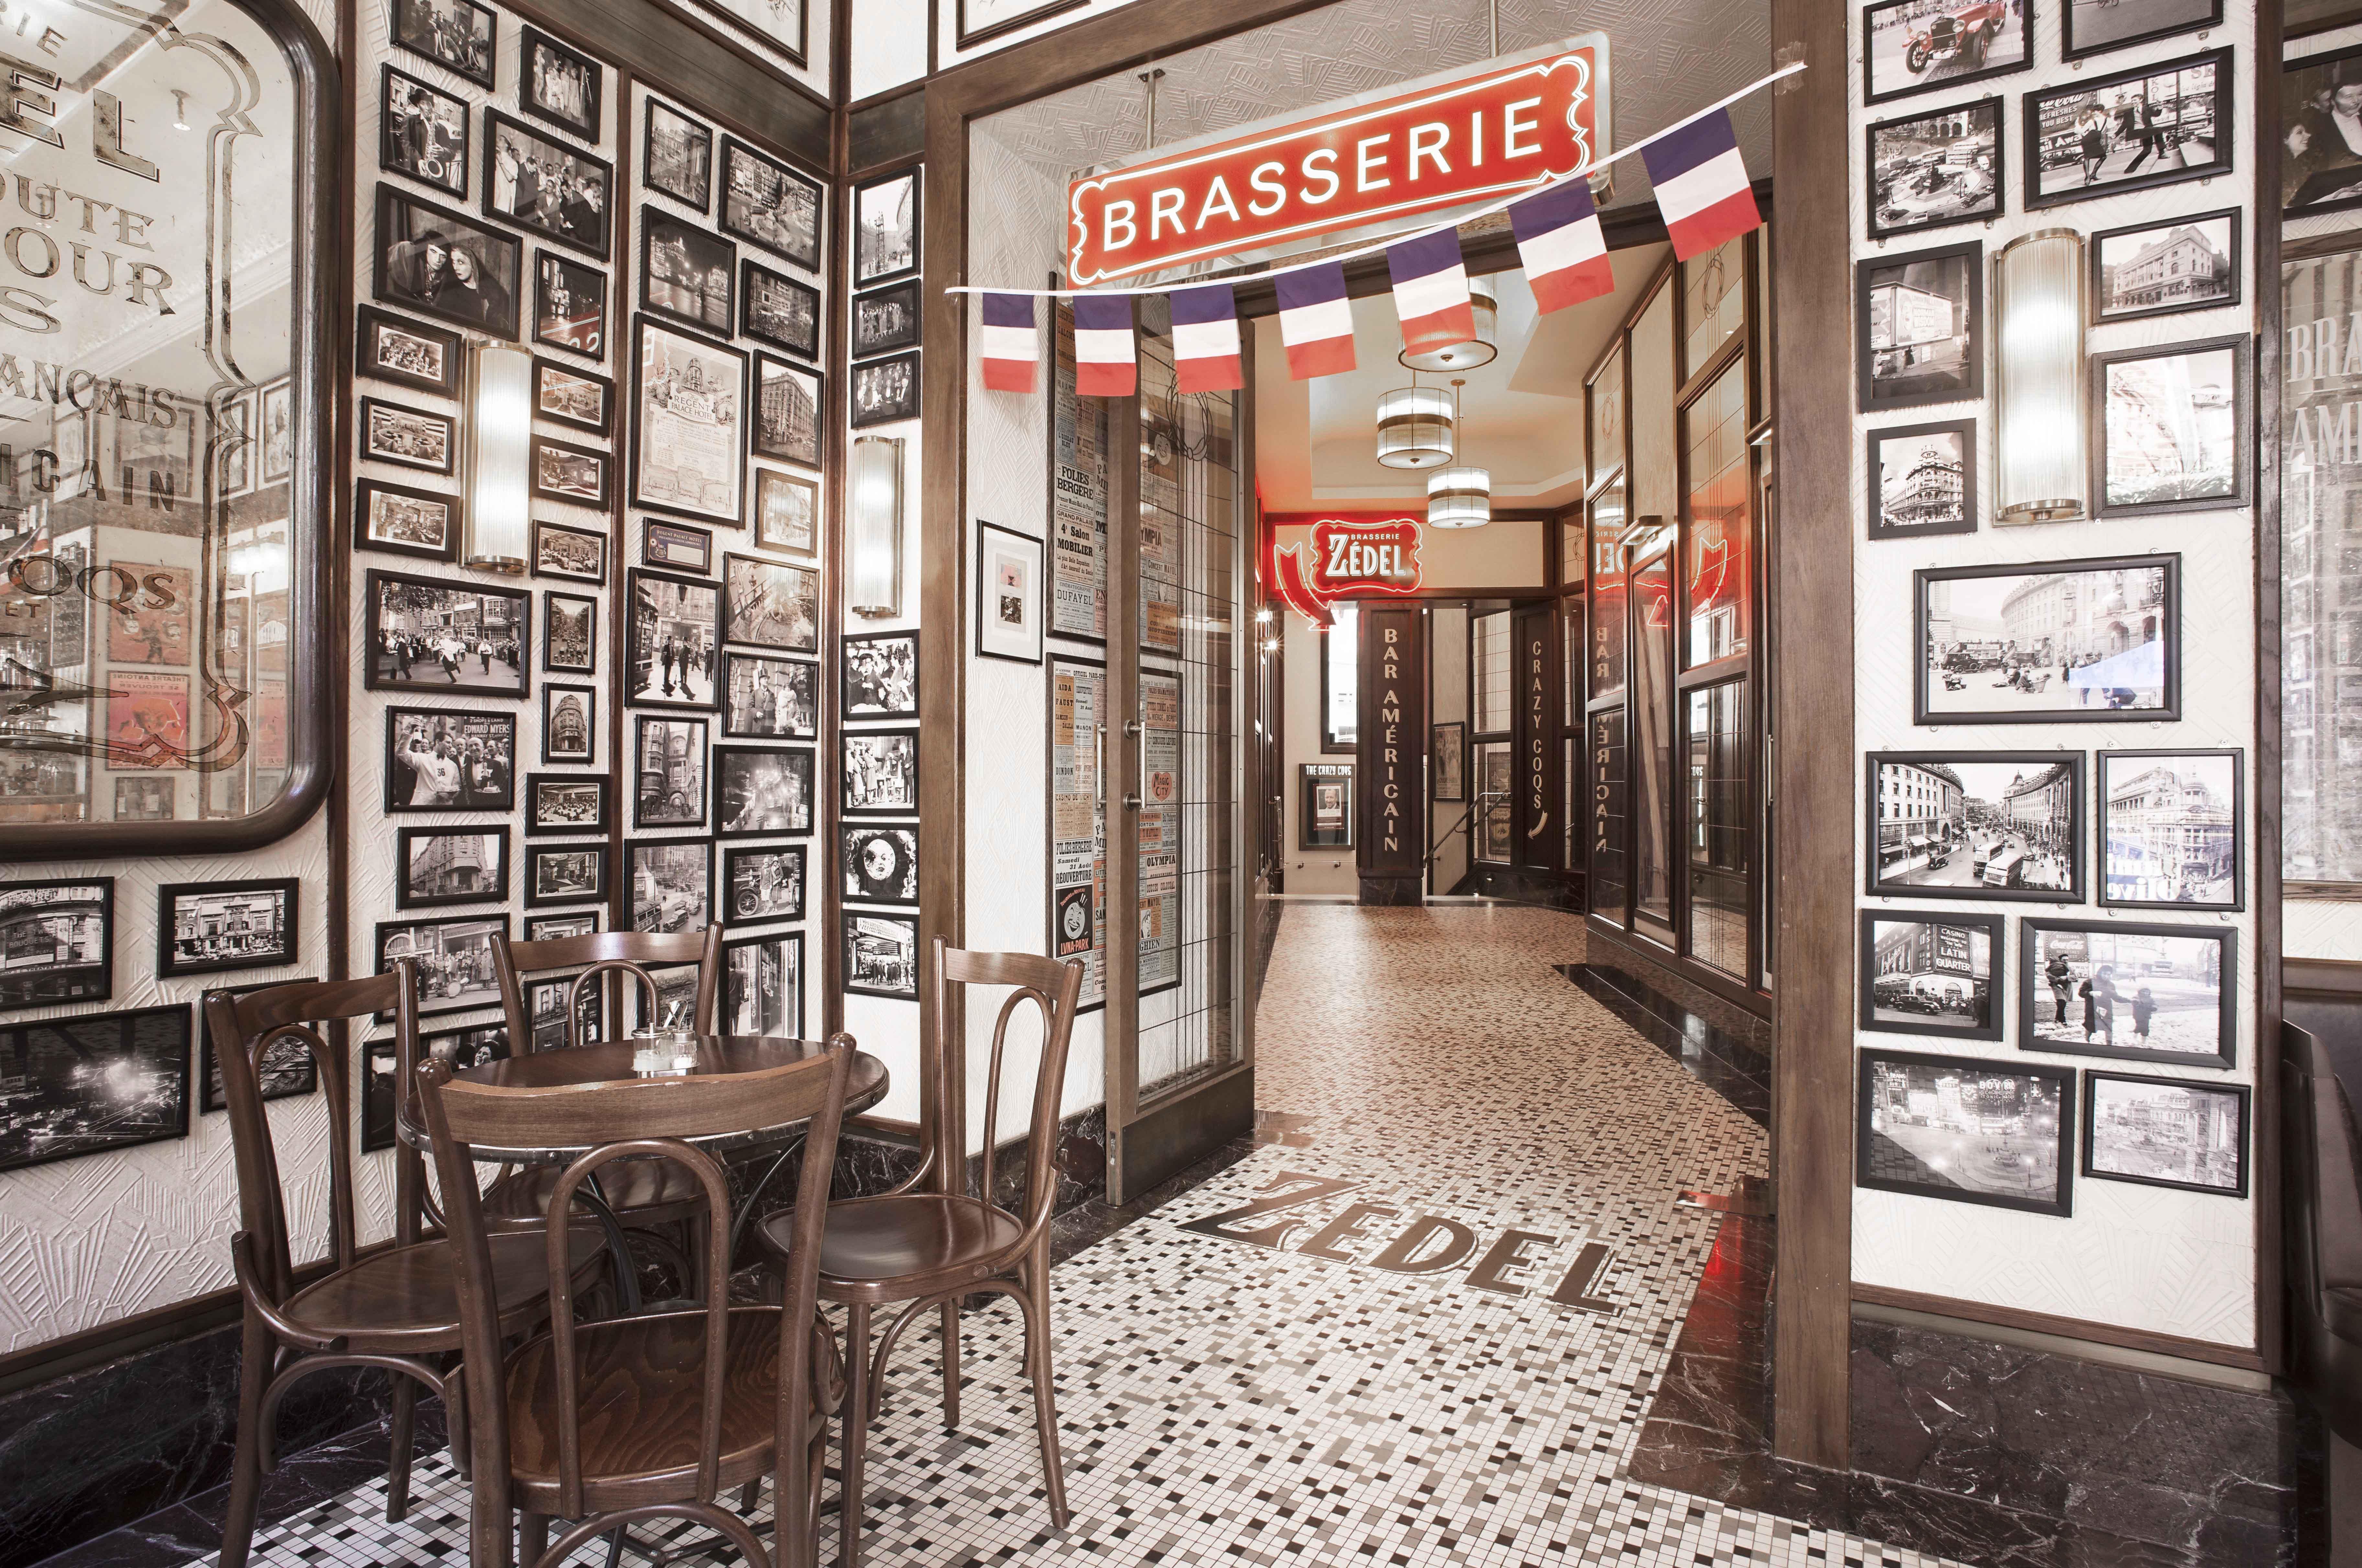 8169-zedel-cafe alex Robertson